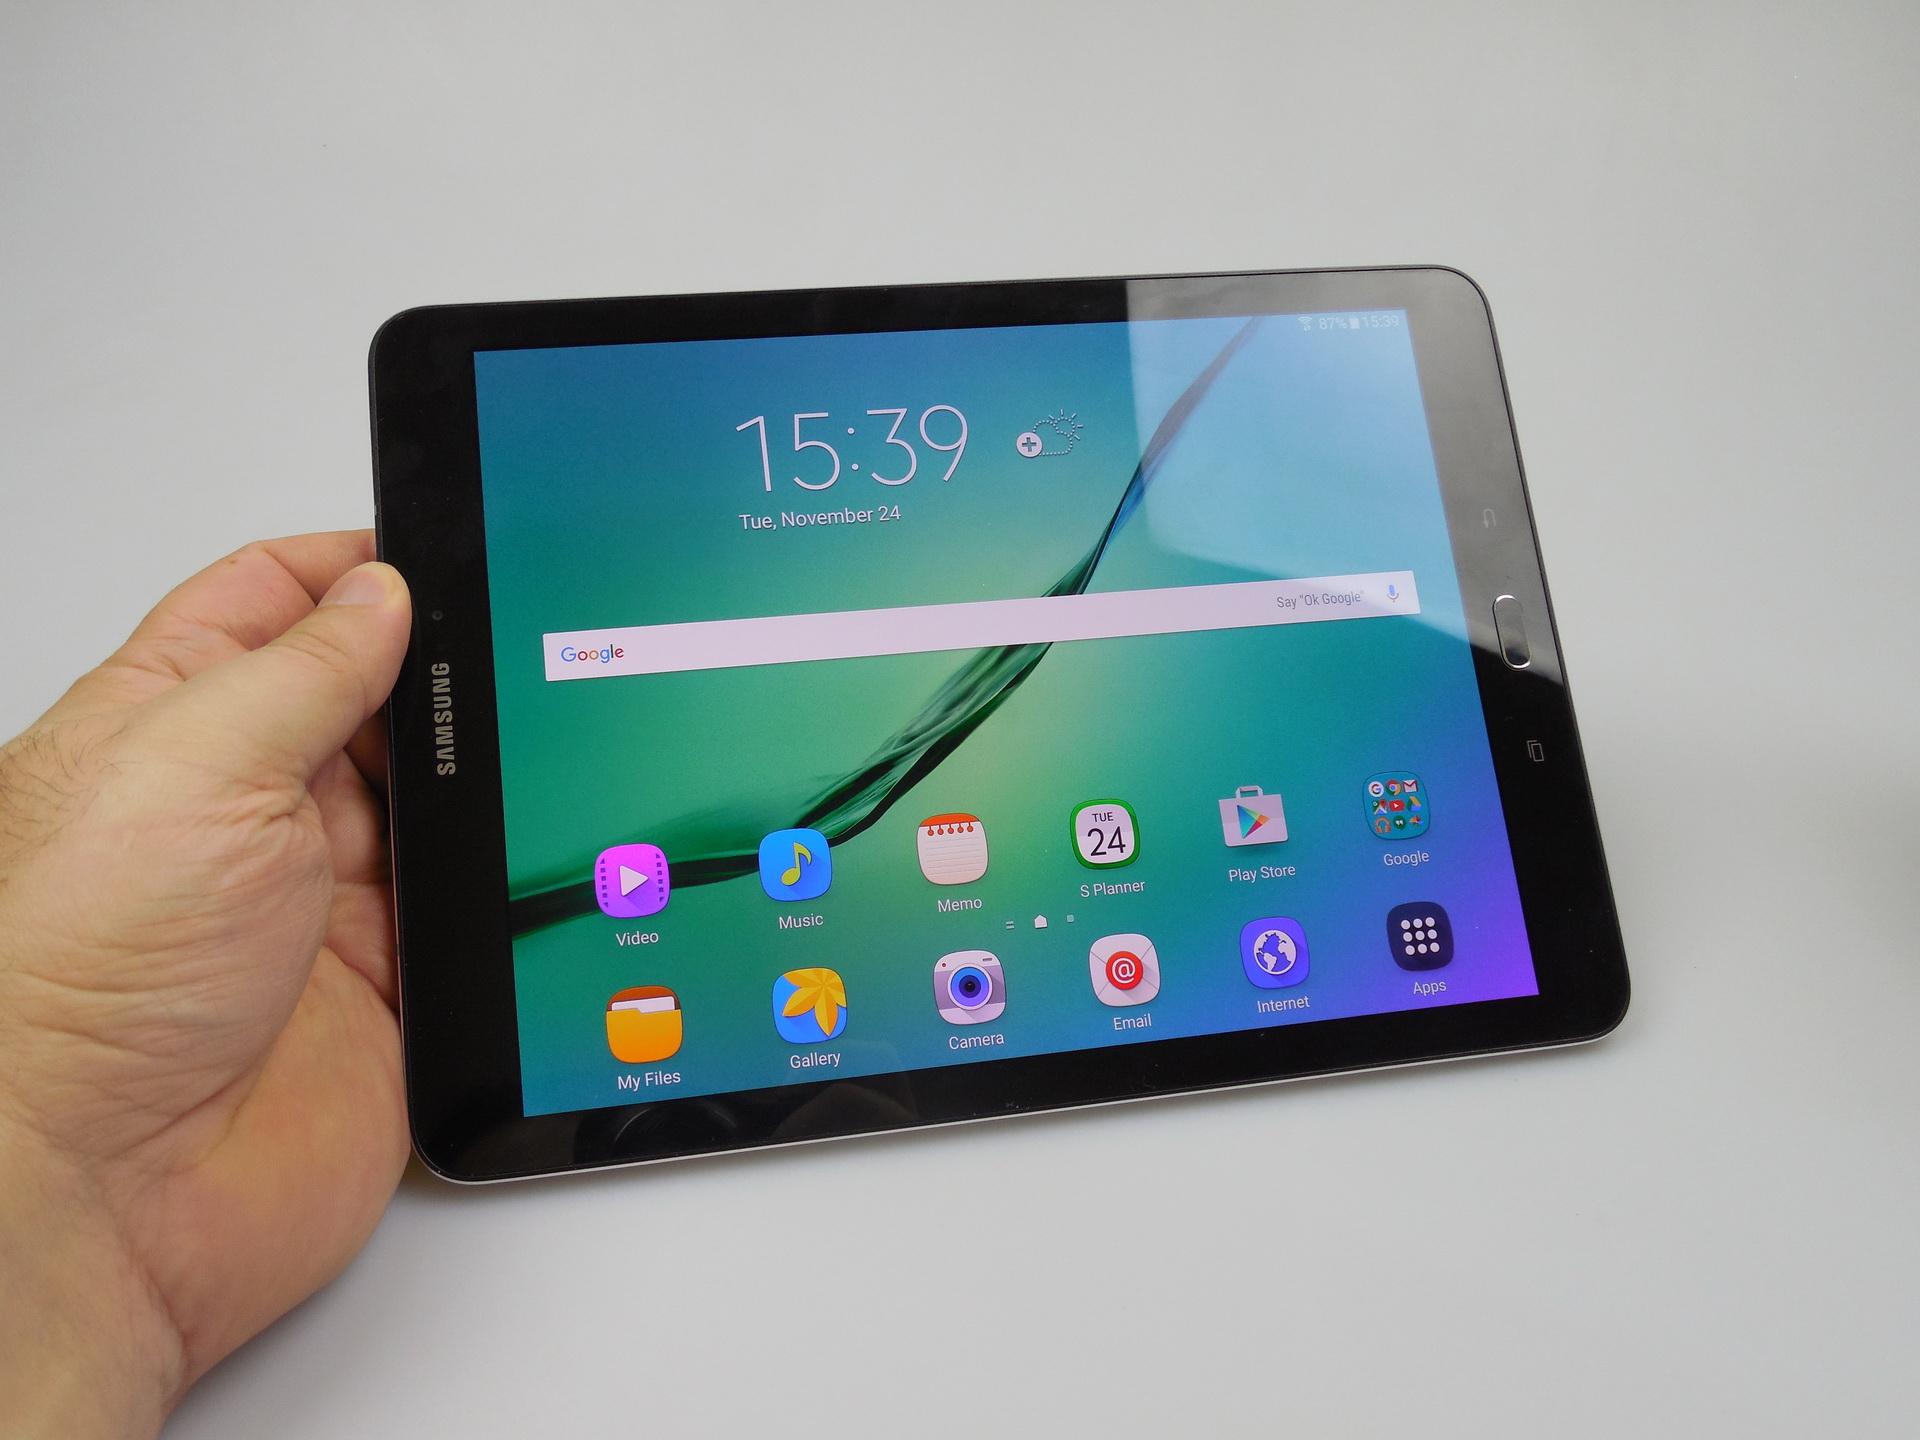 Samsung-Galaxy-Tab-S2-9-7 040 - Tablet News 9c7ea09084c9